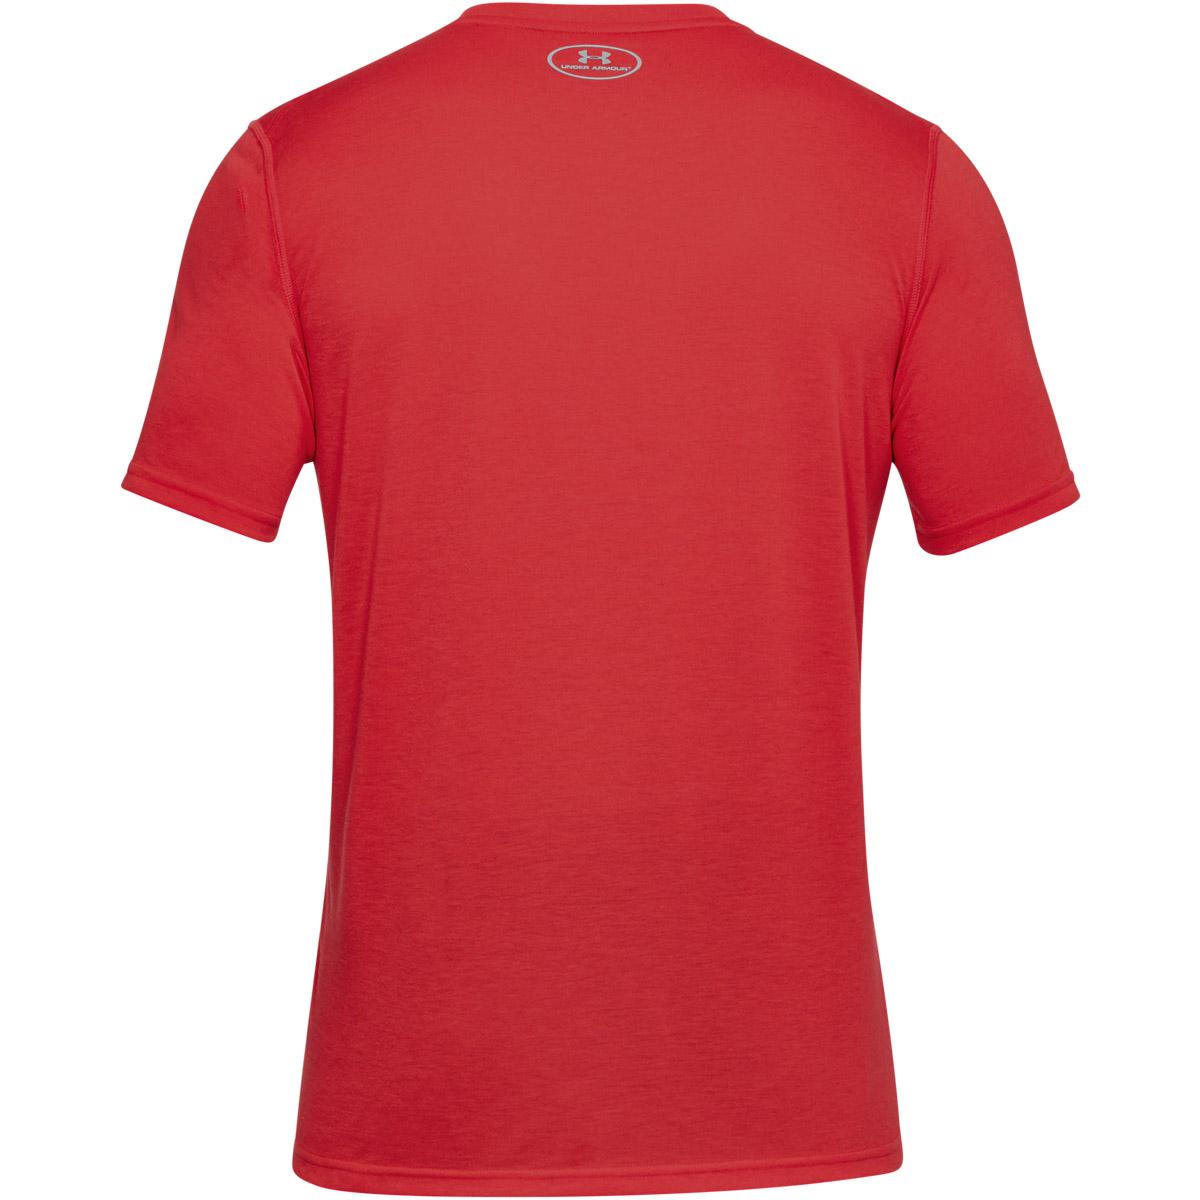 Under-Armour-Mens-UA-Threadborne-Fitted-Short-Sleeve-Gym-Tee-Sport-T-Shirt thumbnail 30